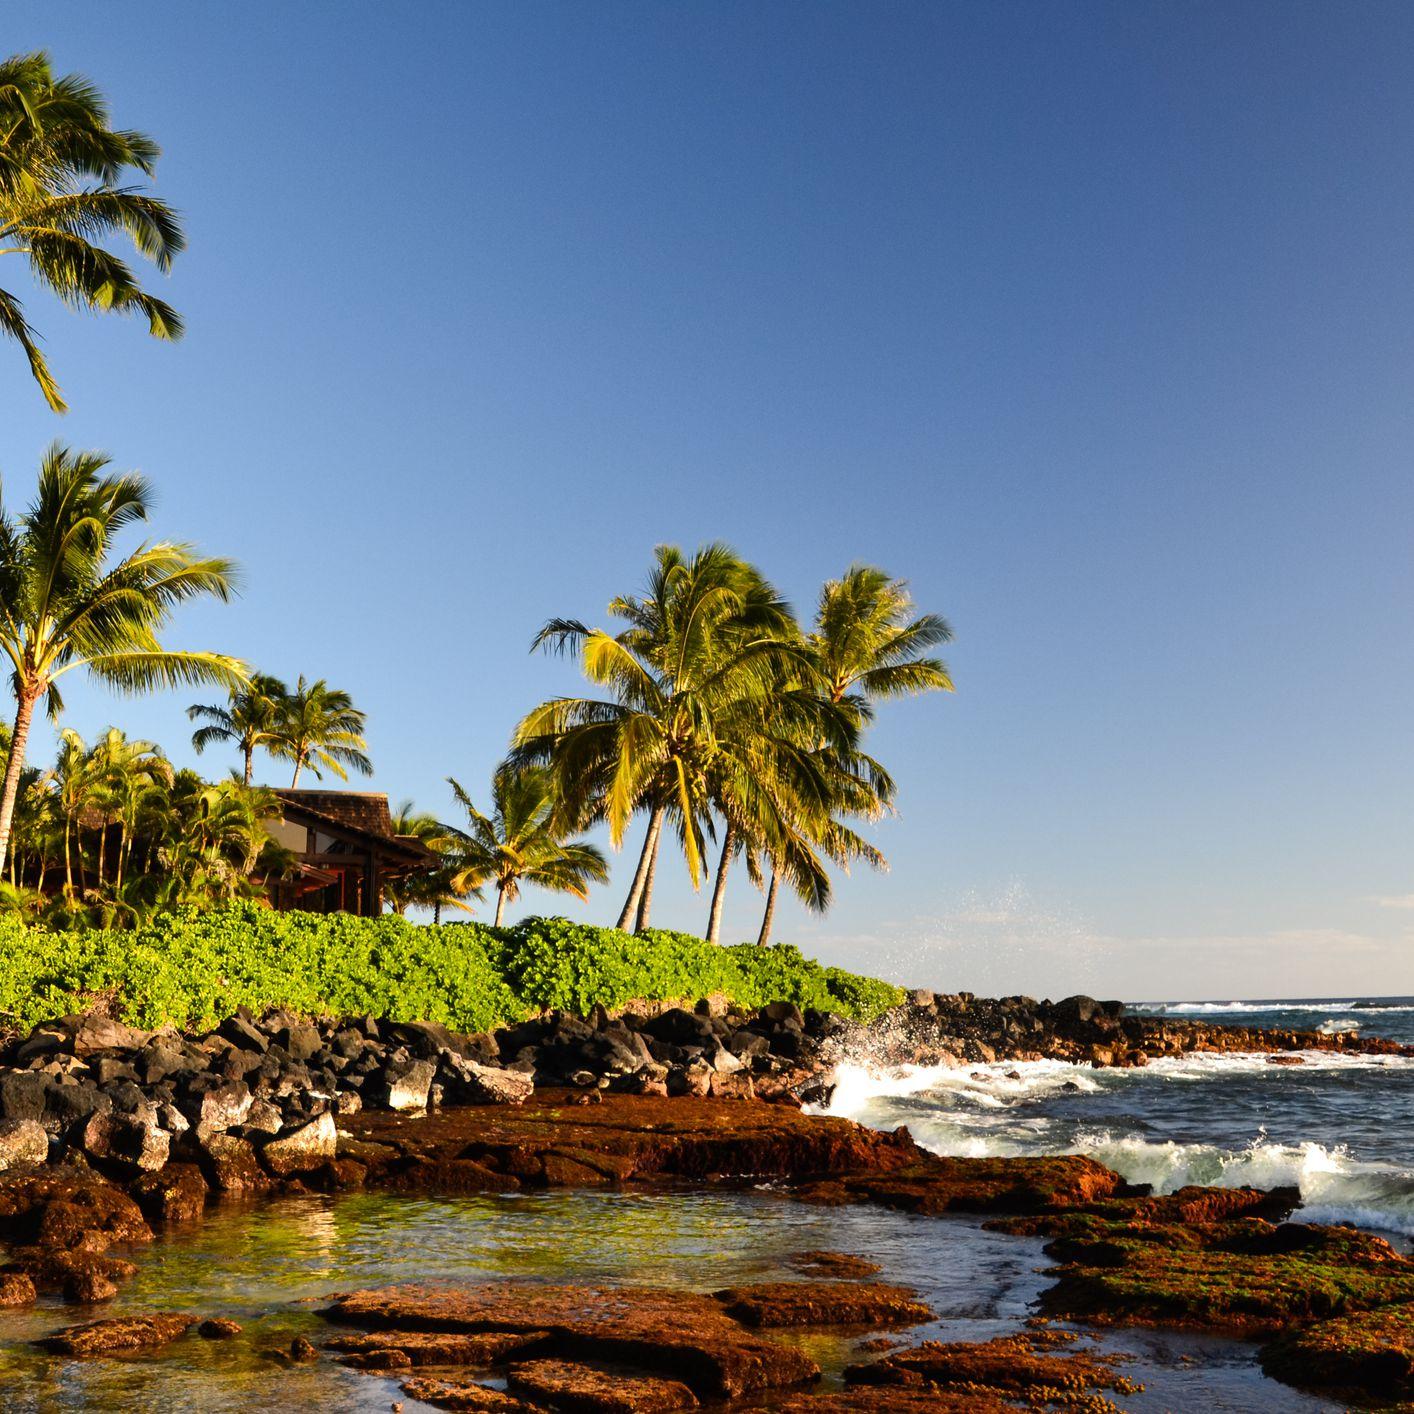 Where to Go Snorkeling on Kauai